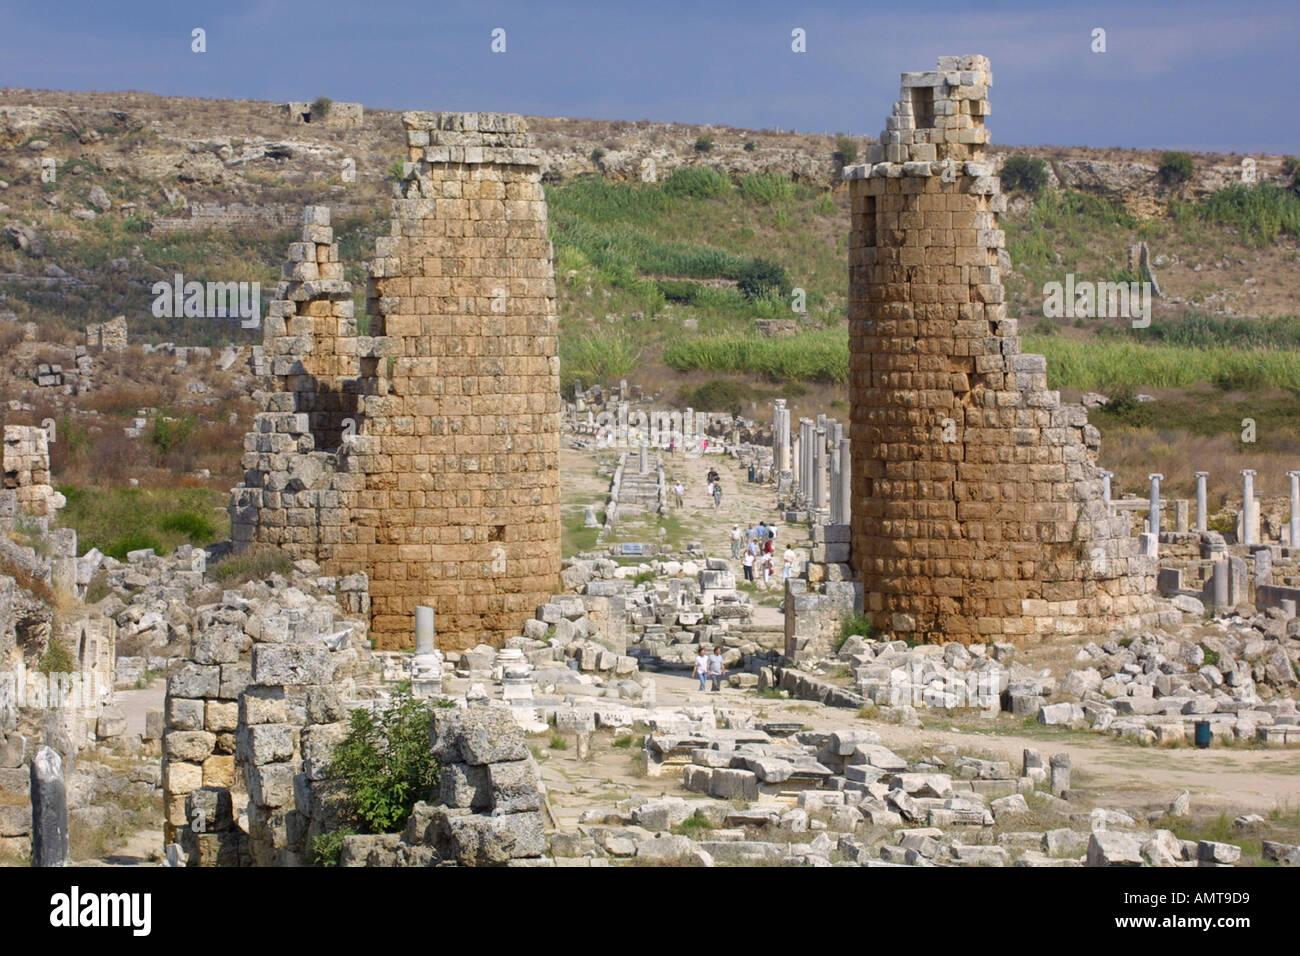 Roman ruins of Perge in Antalya Turkey Stock Photo, Royalty Free Image: 28533...